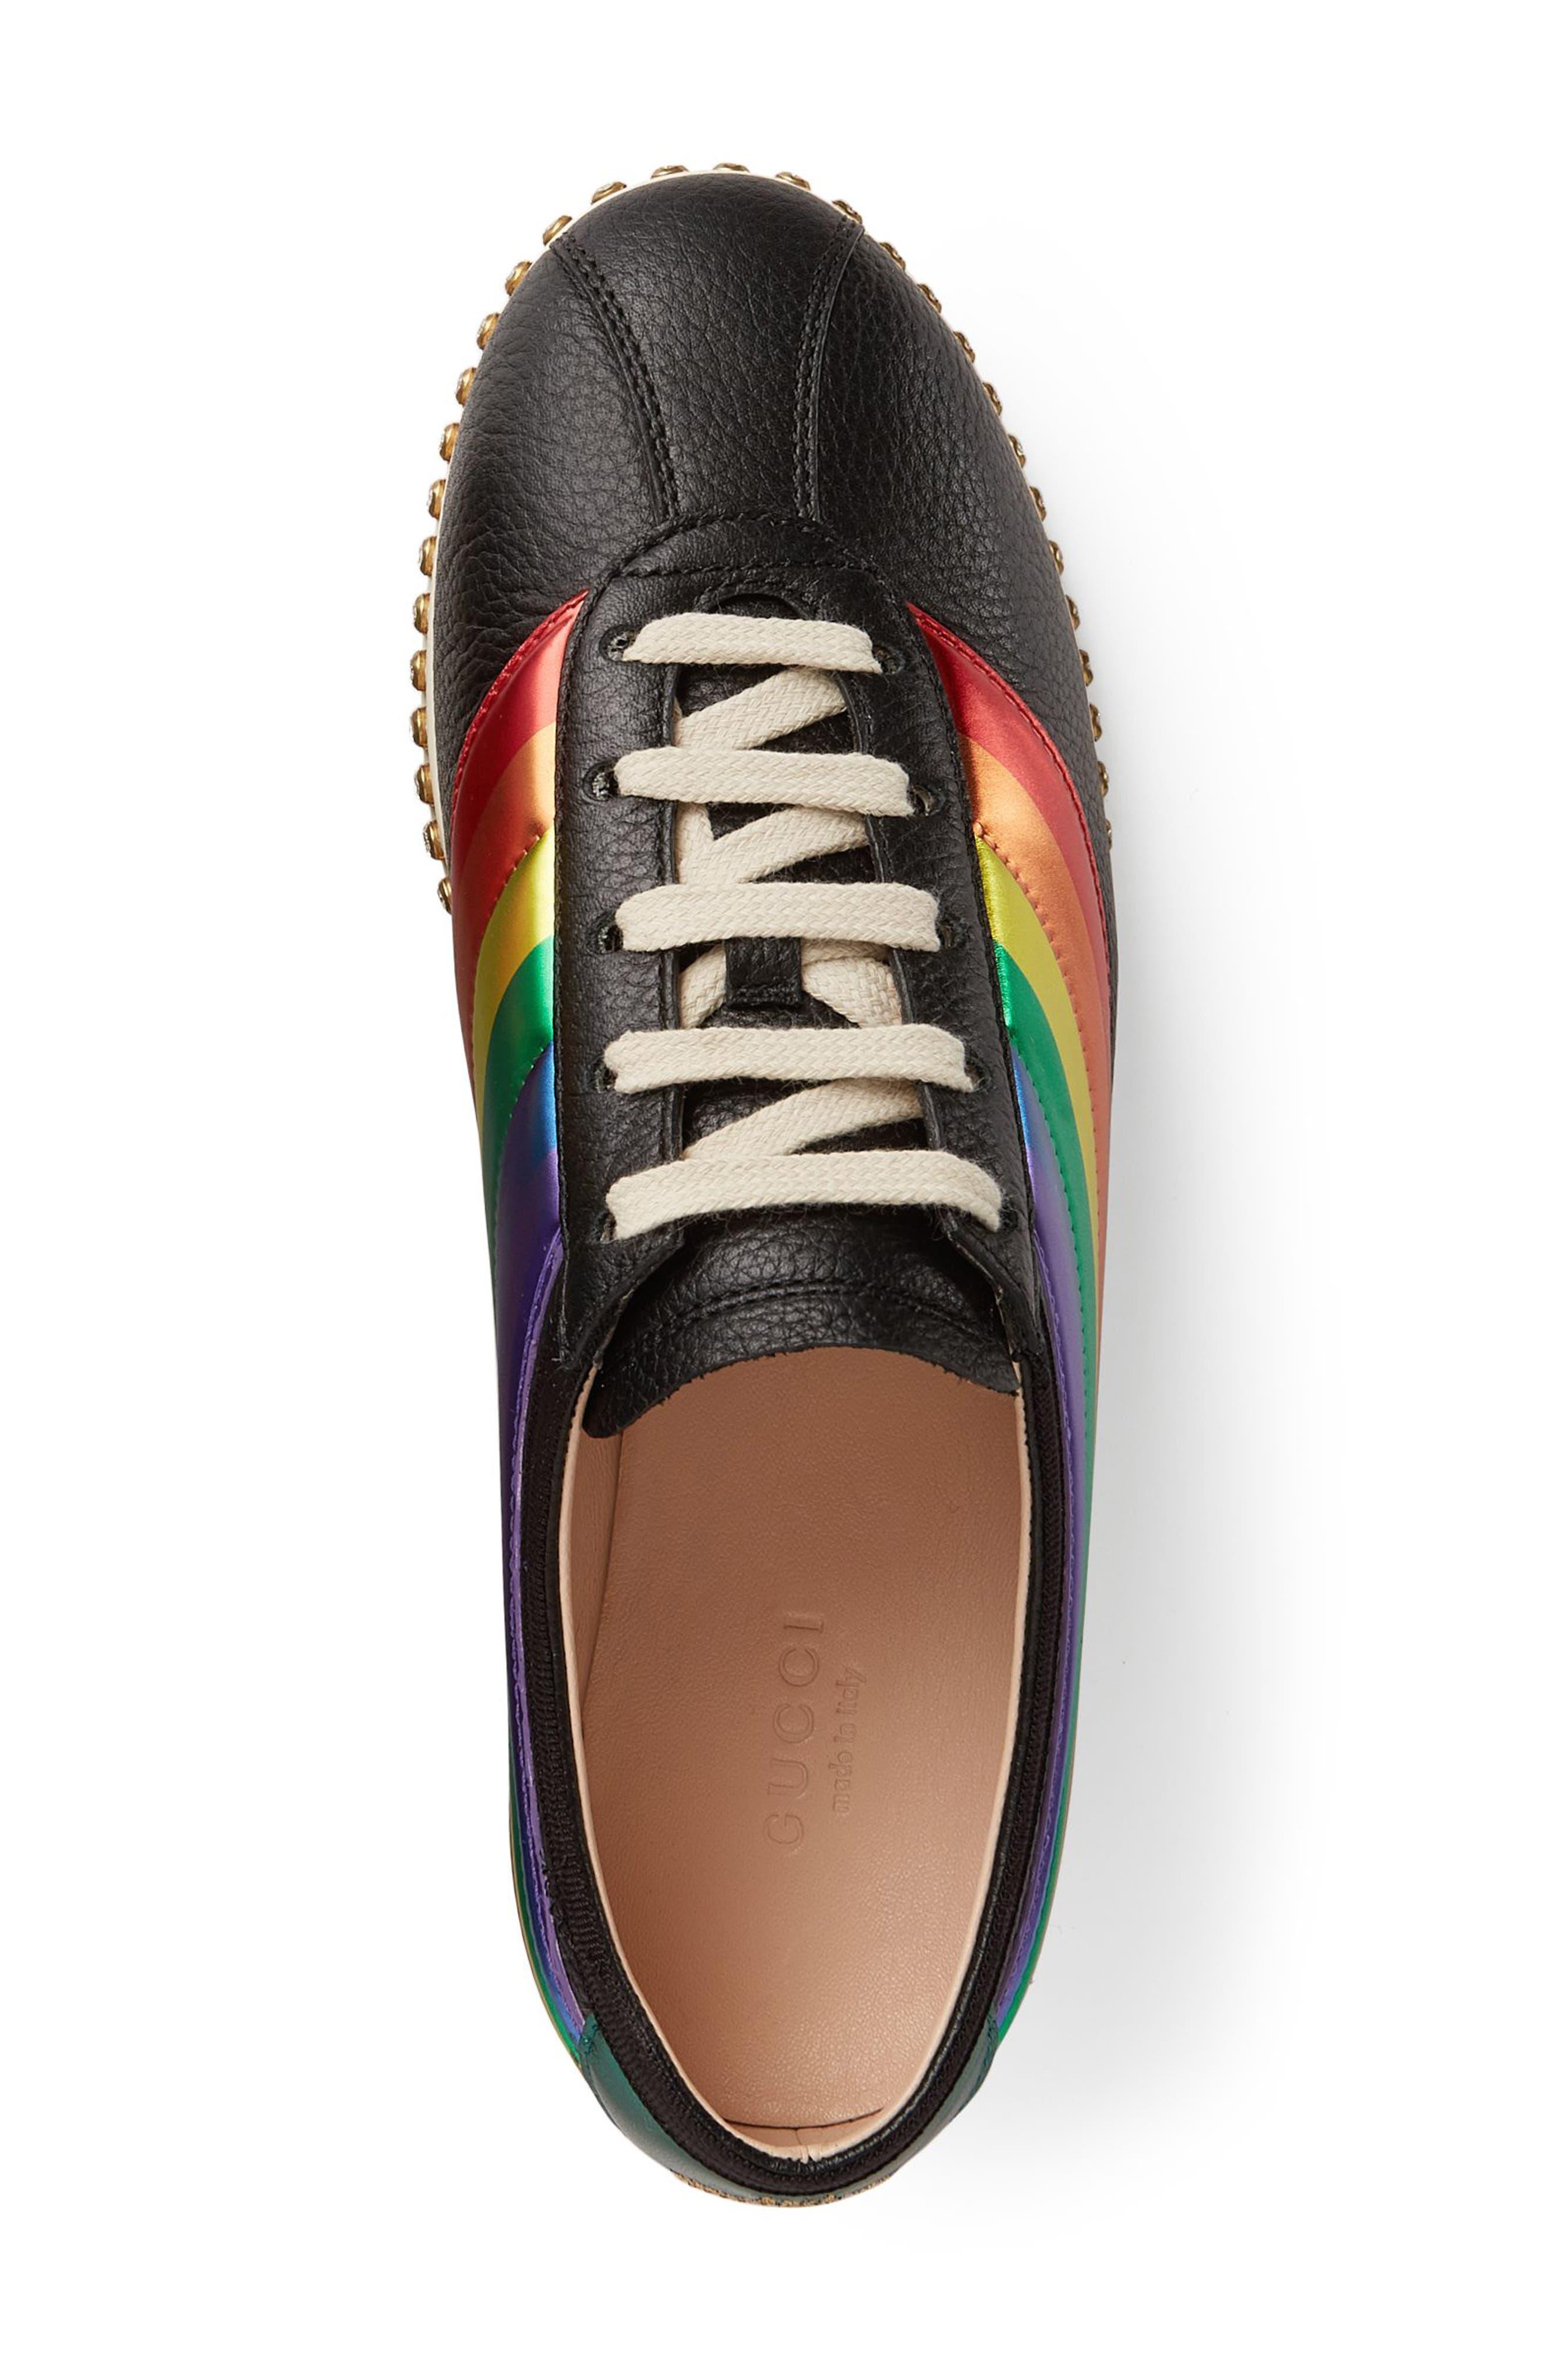 Falacer Sneaker,                             Alternate thumbnail 3, color,                             Black